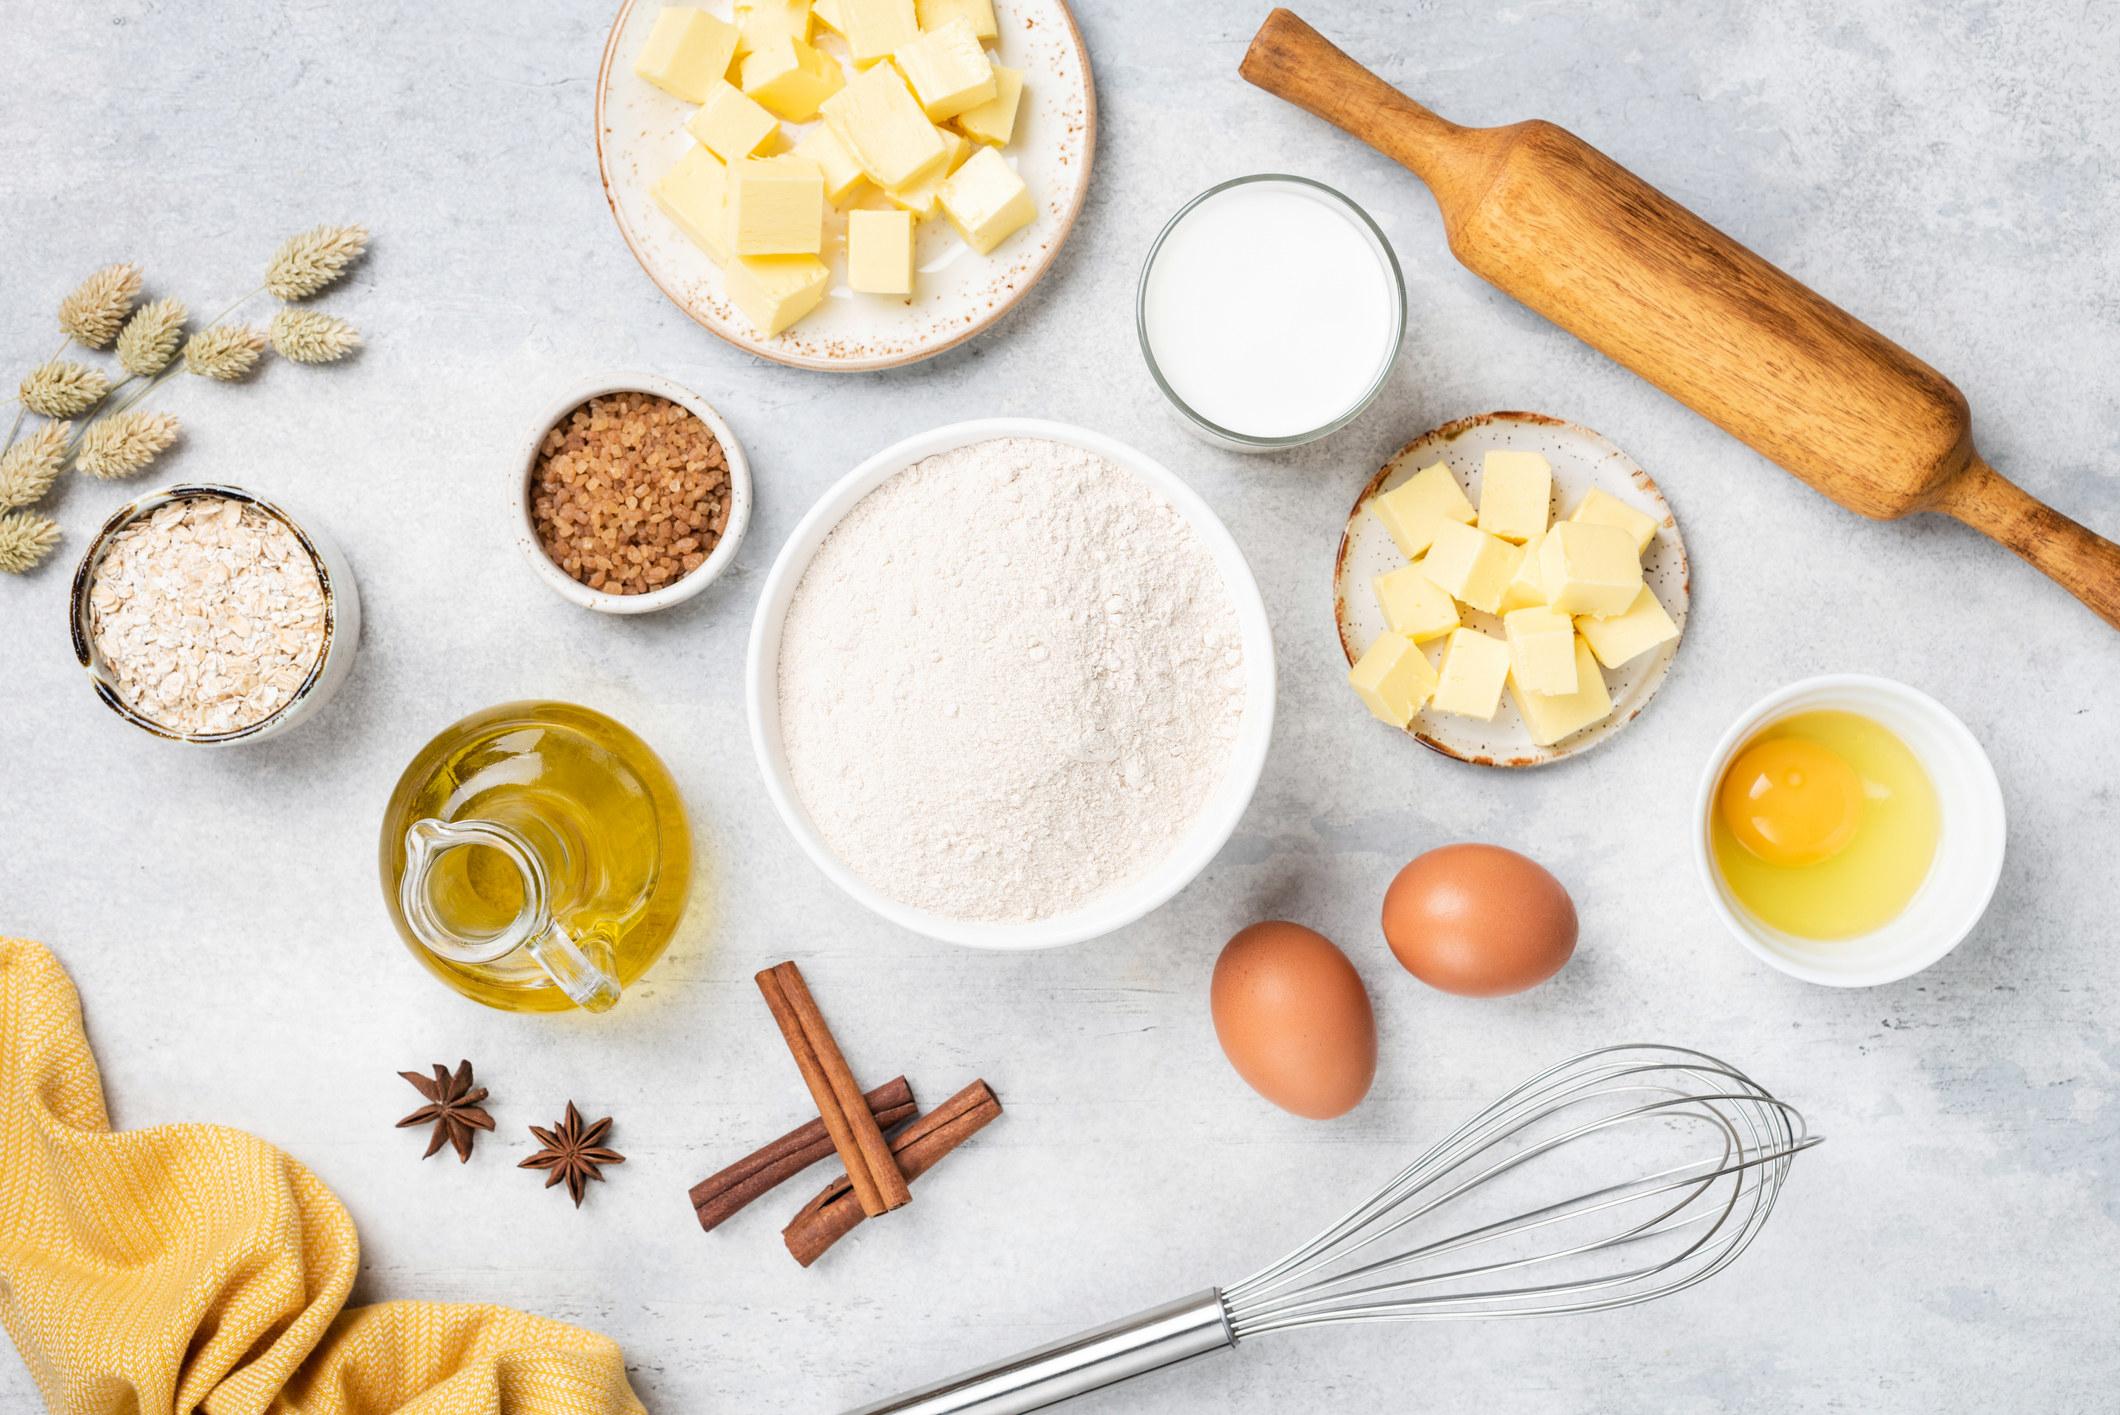 Ingredients for baking.